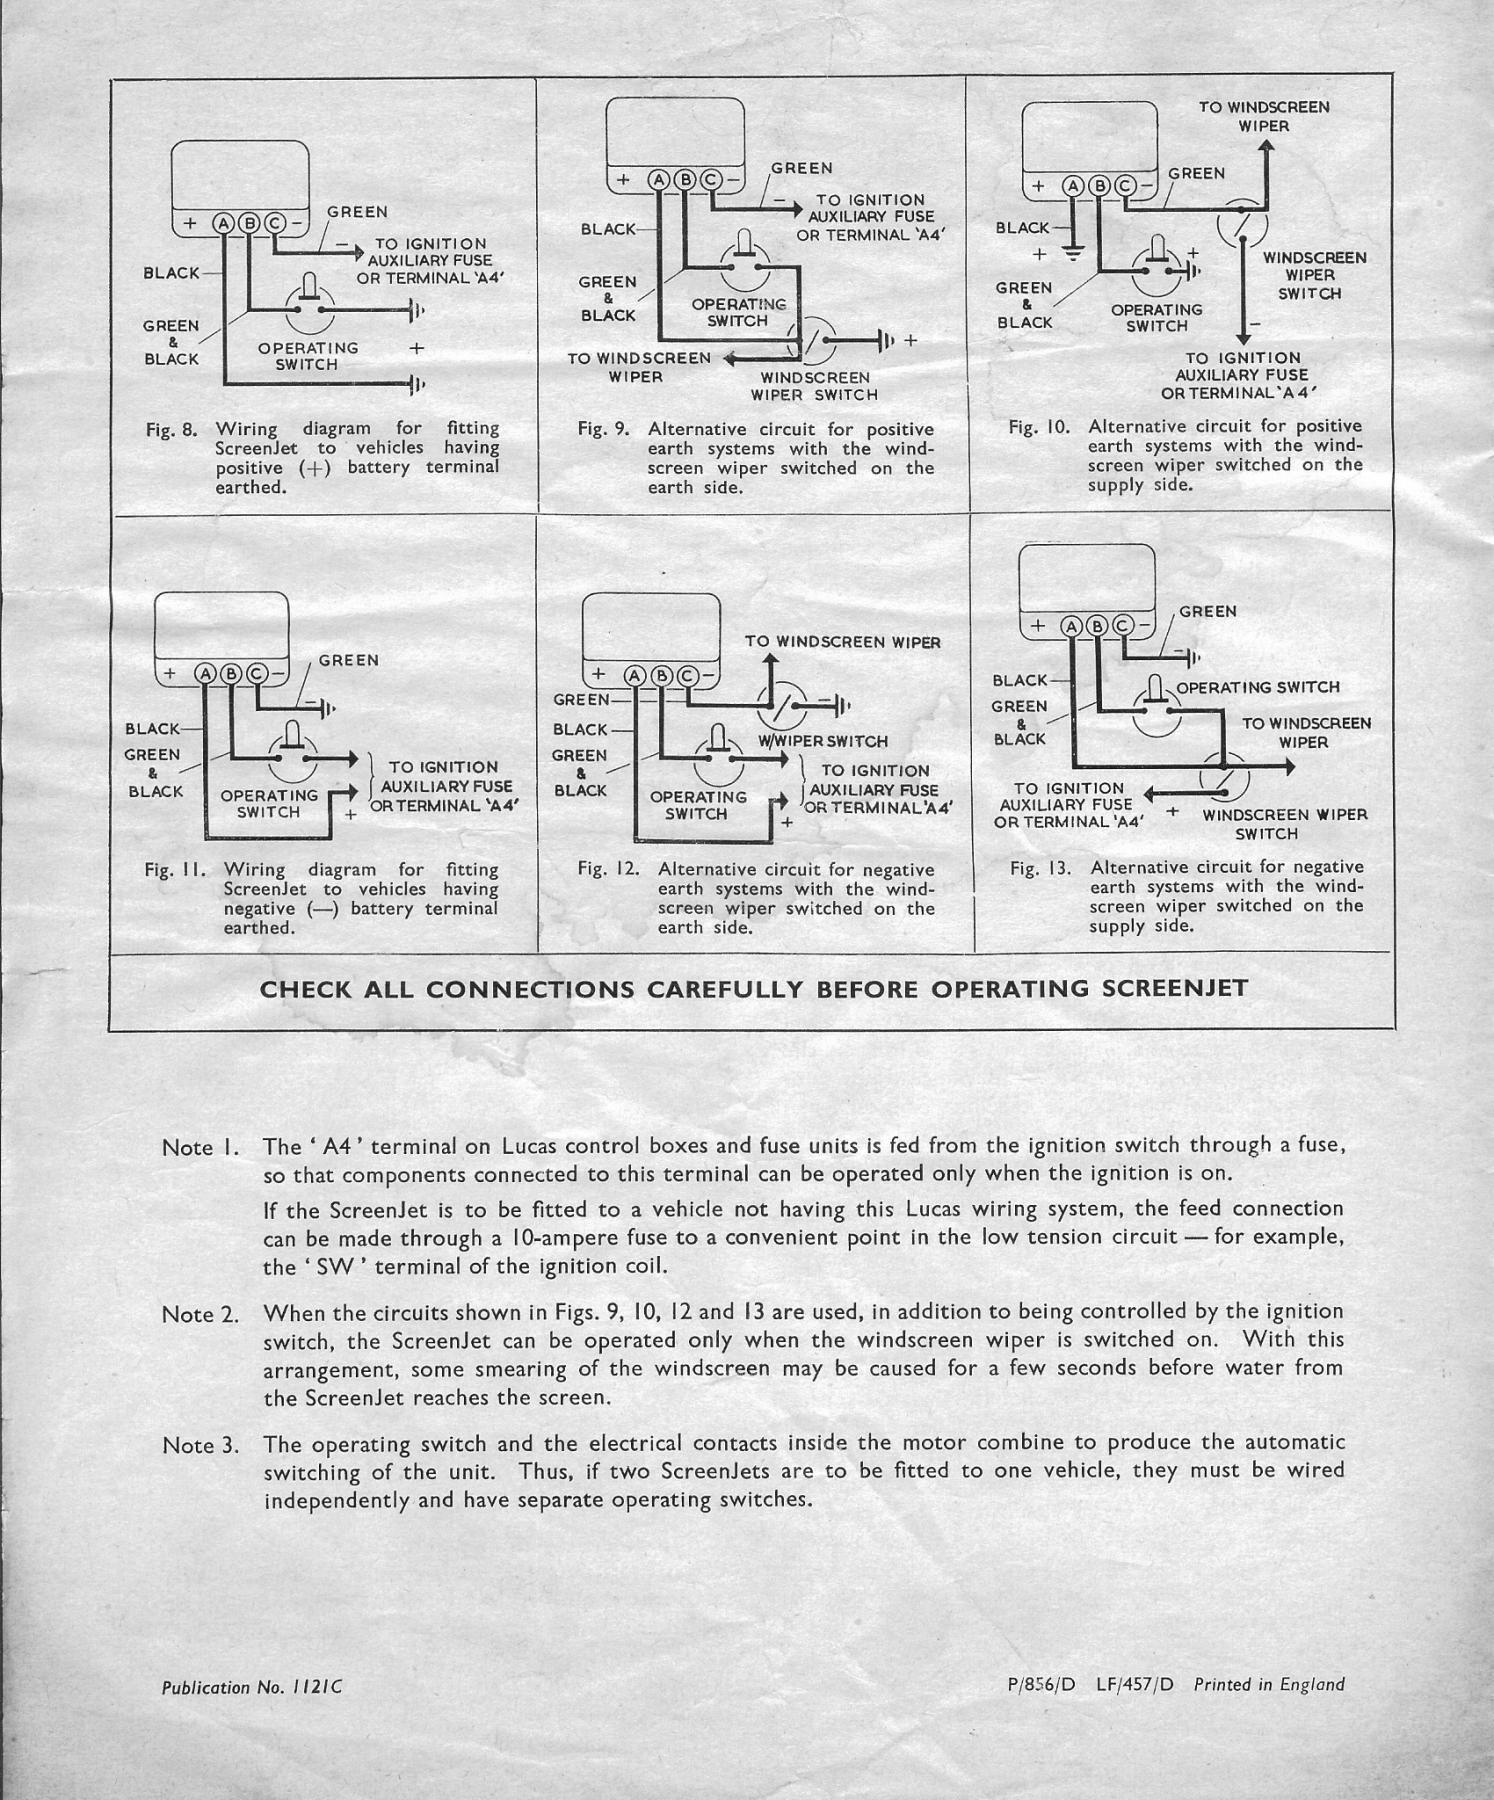 LS_3961] Wiring Diagrams Book Jaguar Mark 2 Mkii Schematic WiringErbug Tial Pap Mohammedshrine Librar Wiring 101